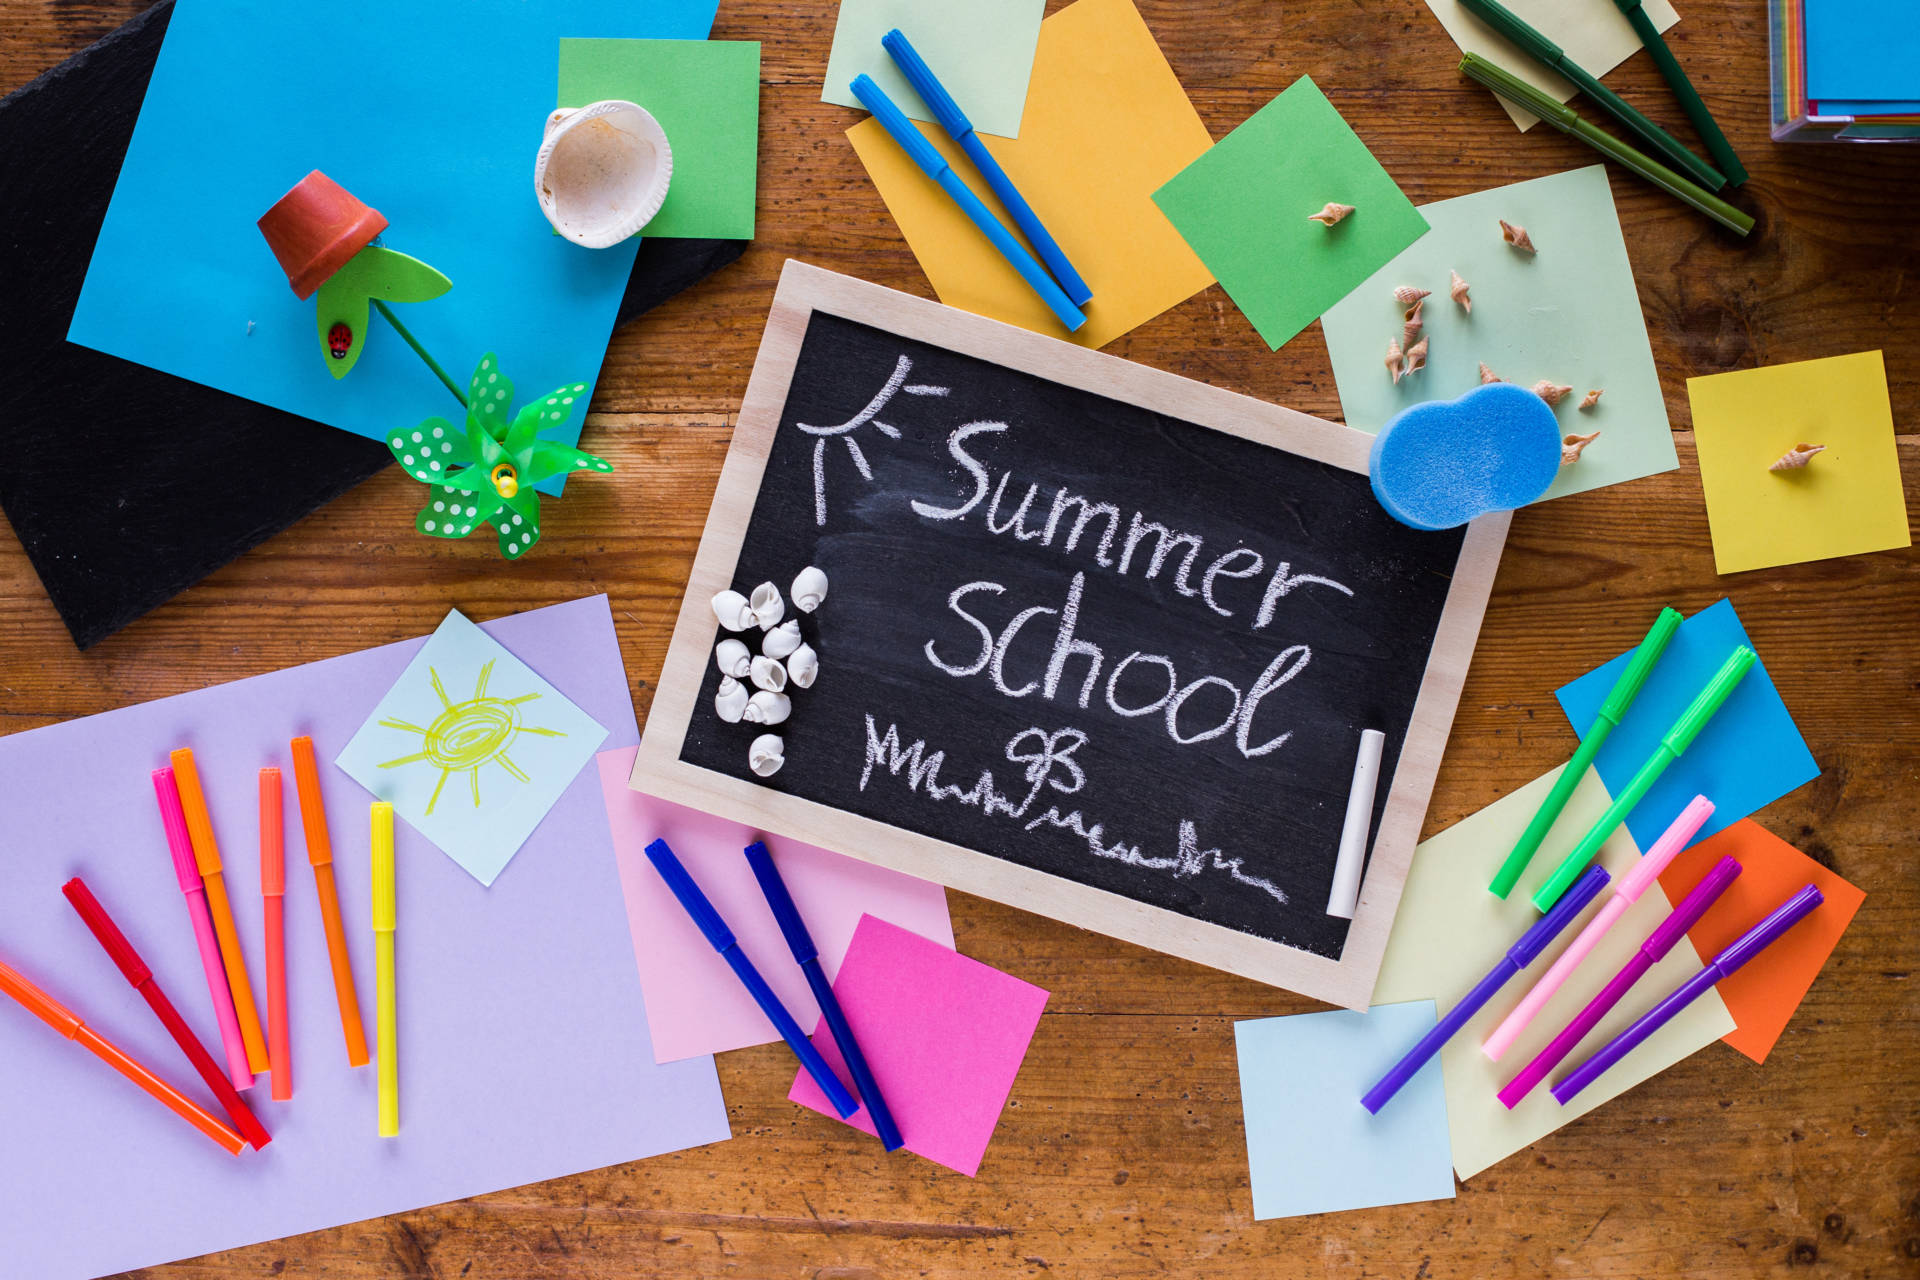 Calling All Bilingual/ESL Teachers: Summer School 2019